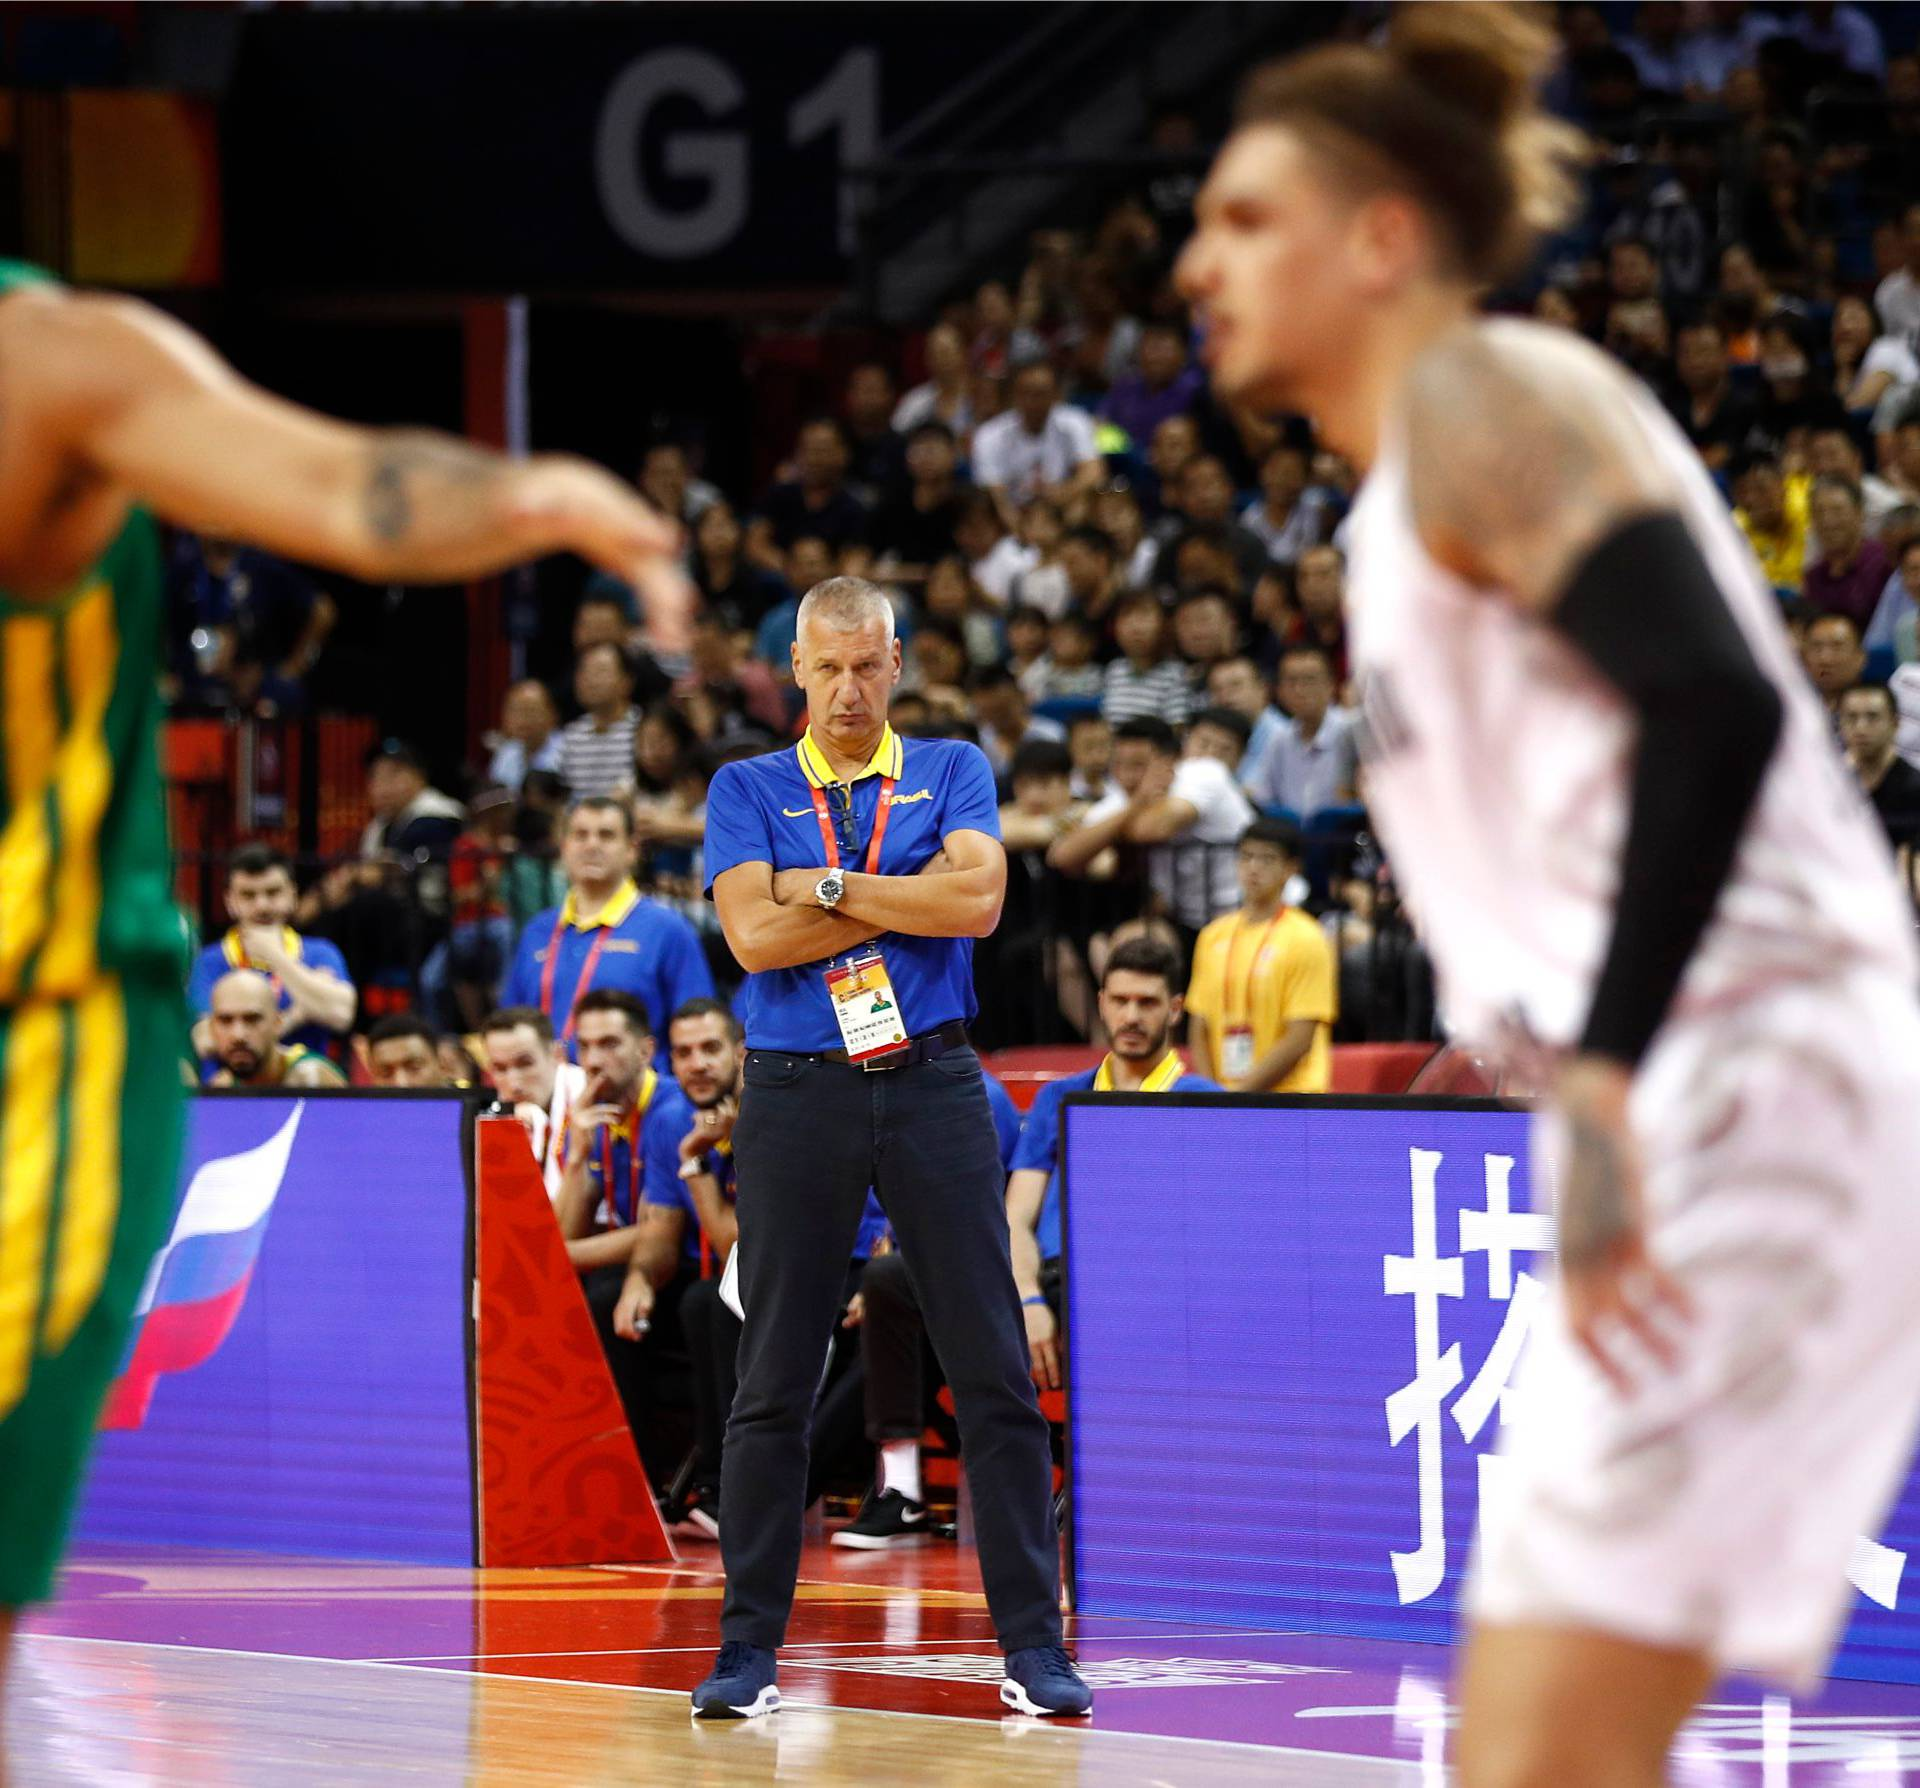 Aco Petrović dobio s Brazilom, Australci pobijedili Kanađane